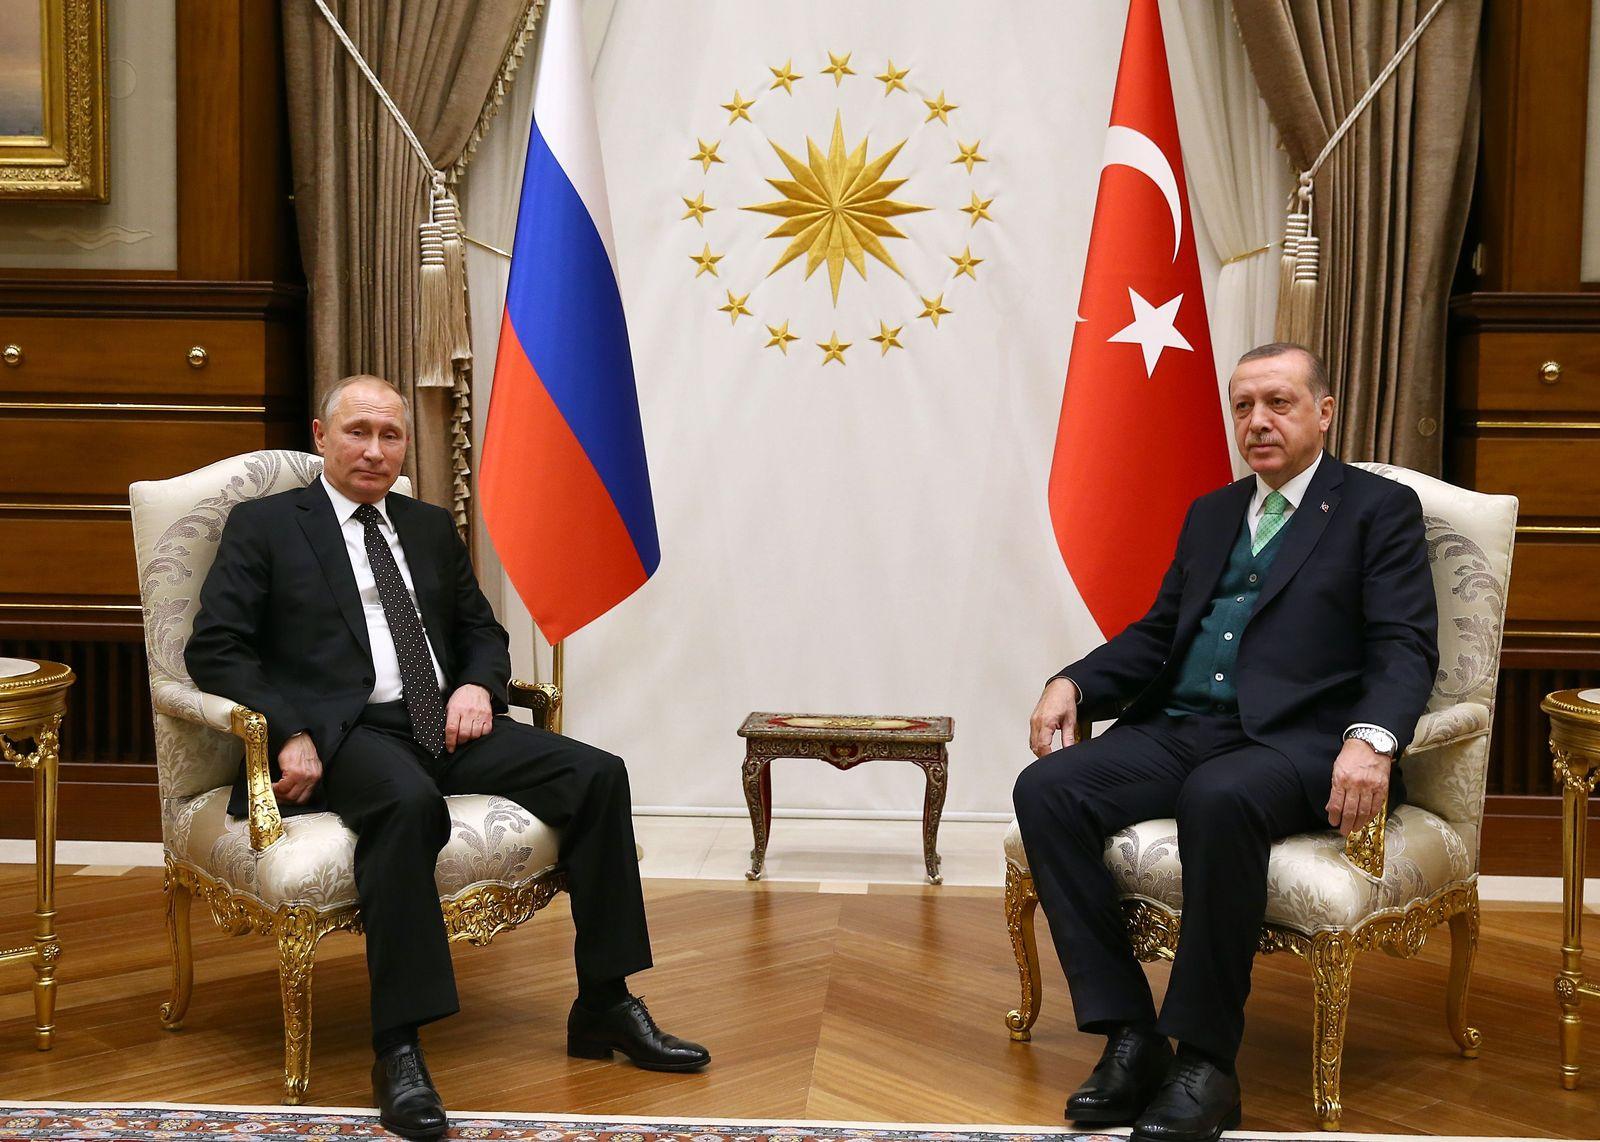 TURKEY-RUSSIA-DIPLOMACY